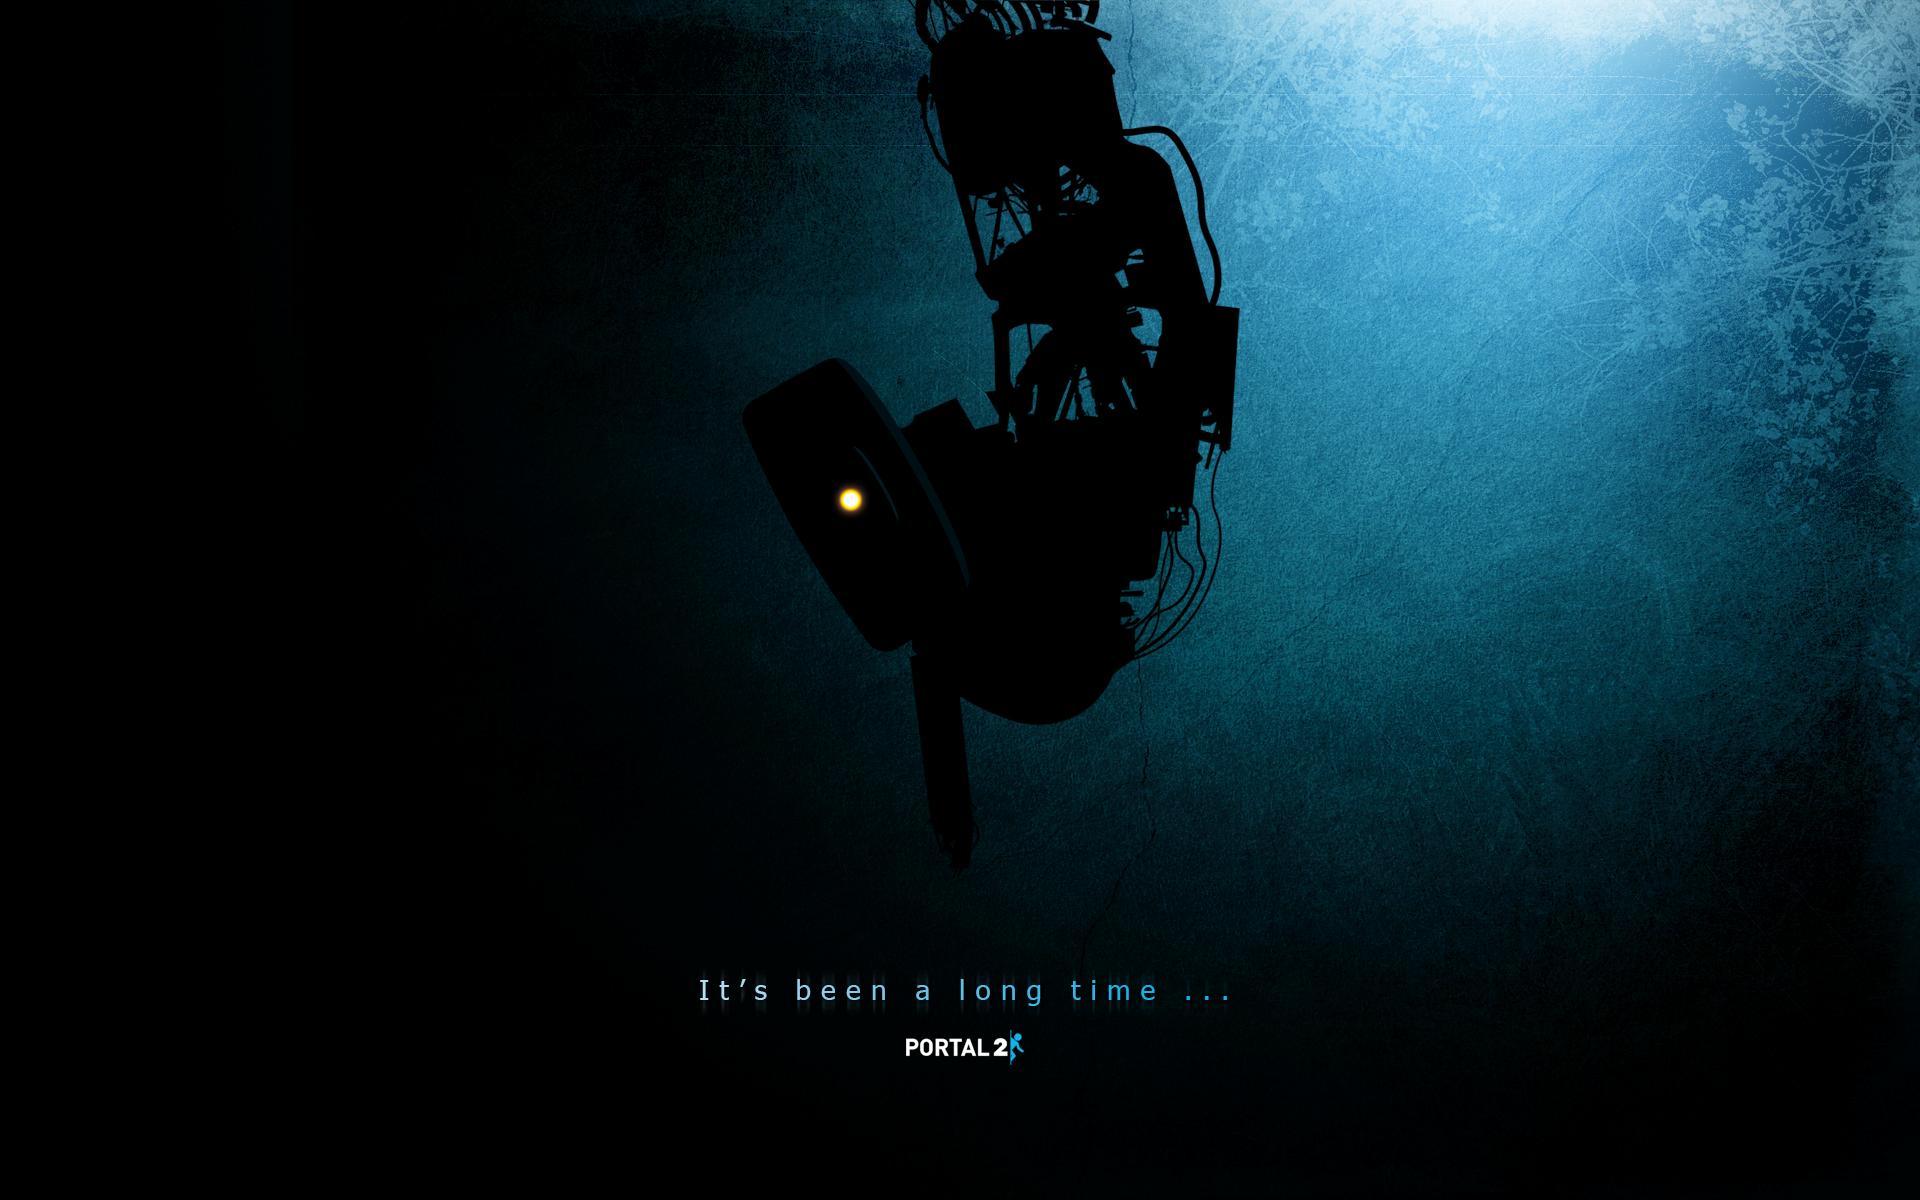 Its been a long time Portal 2 Wallpaper HD